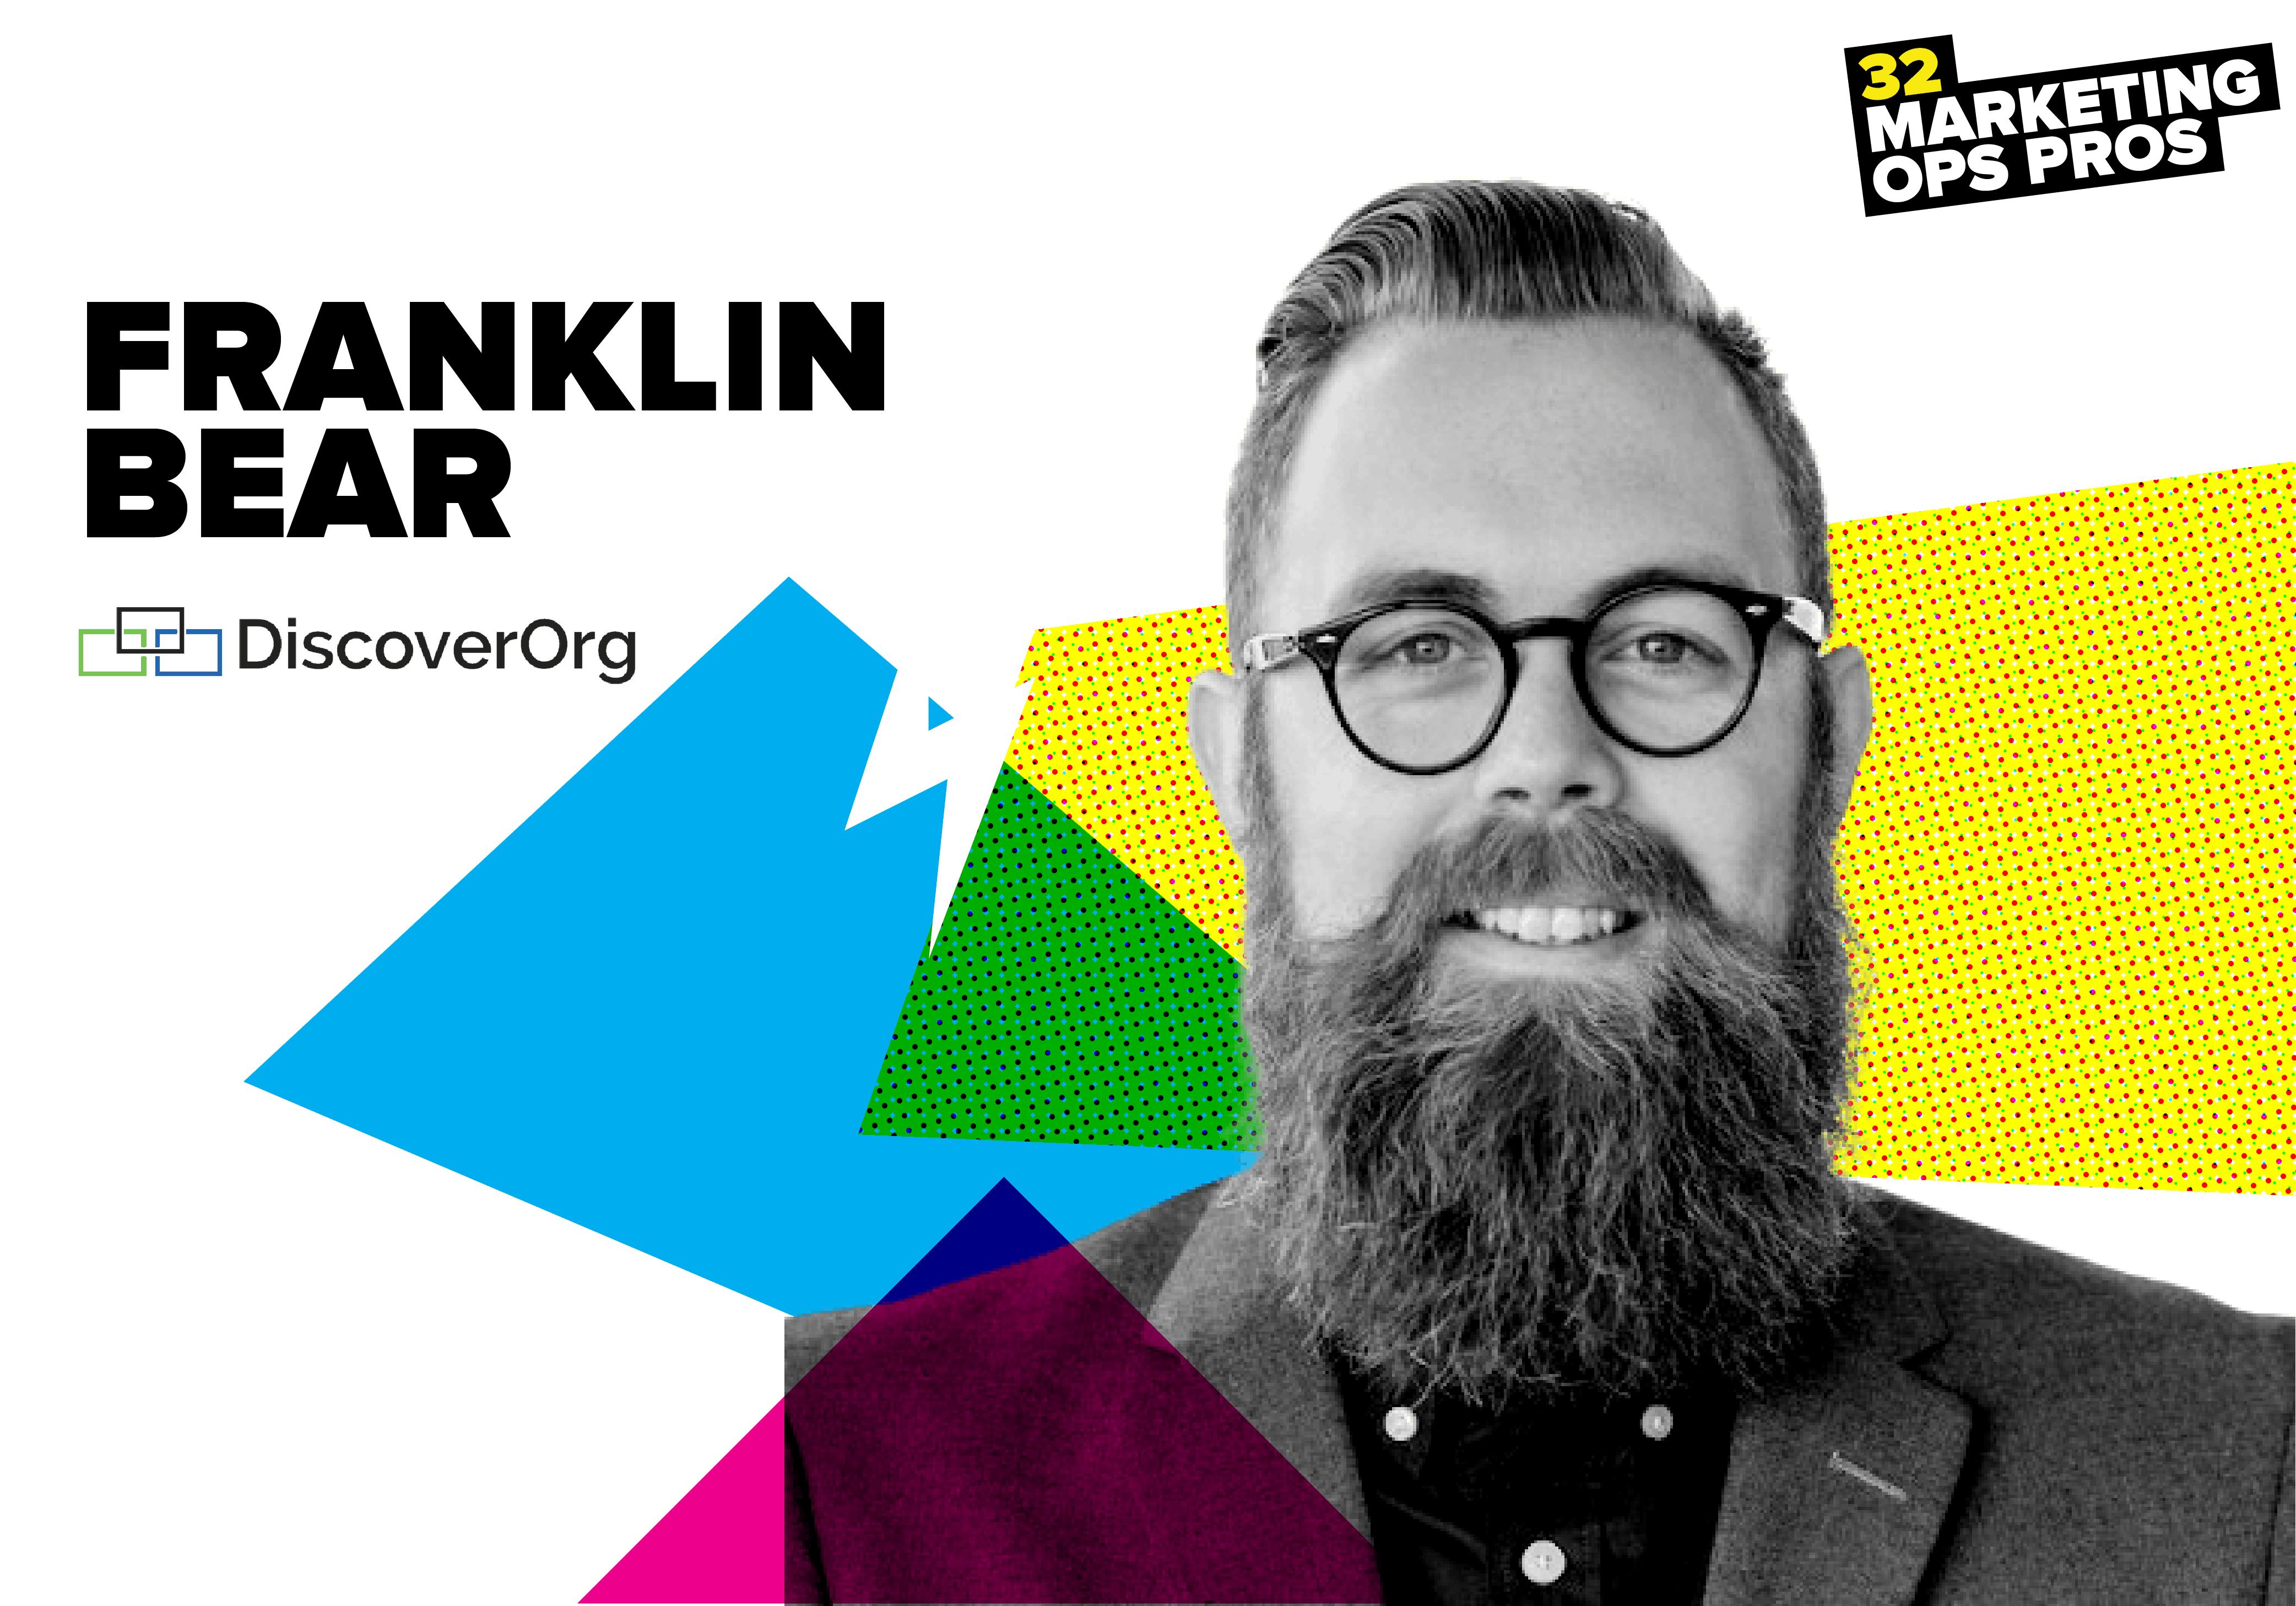 Franklin Bear, DiscoverOrg